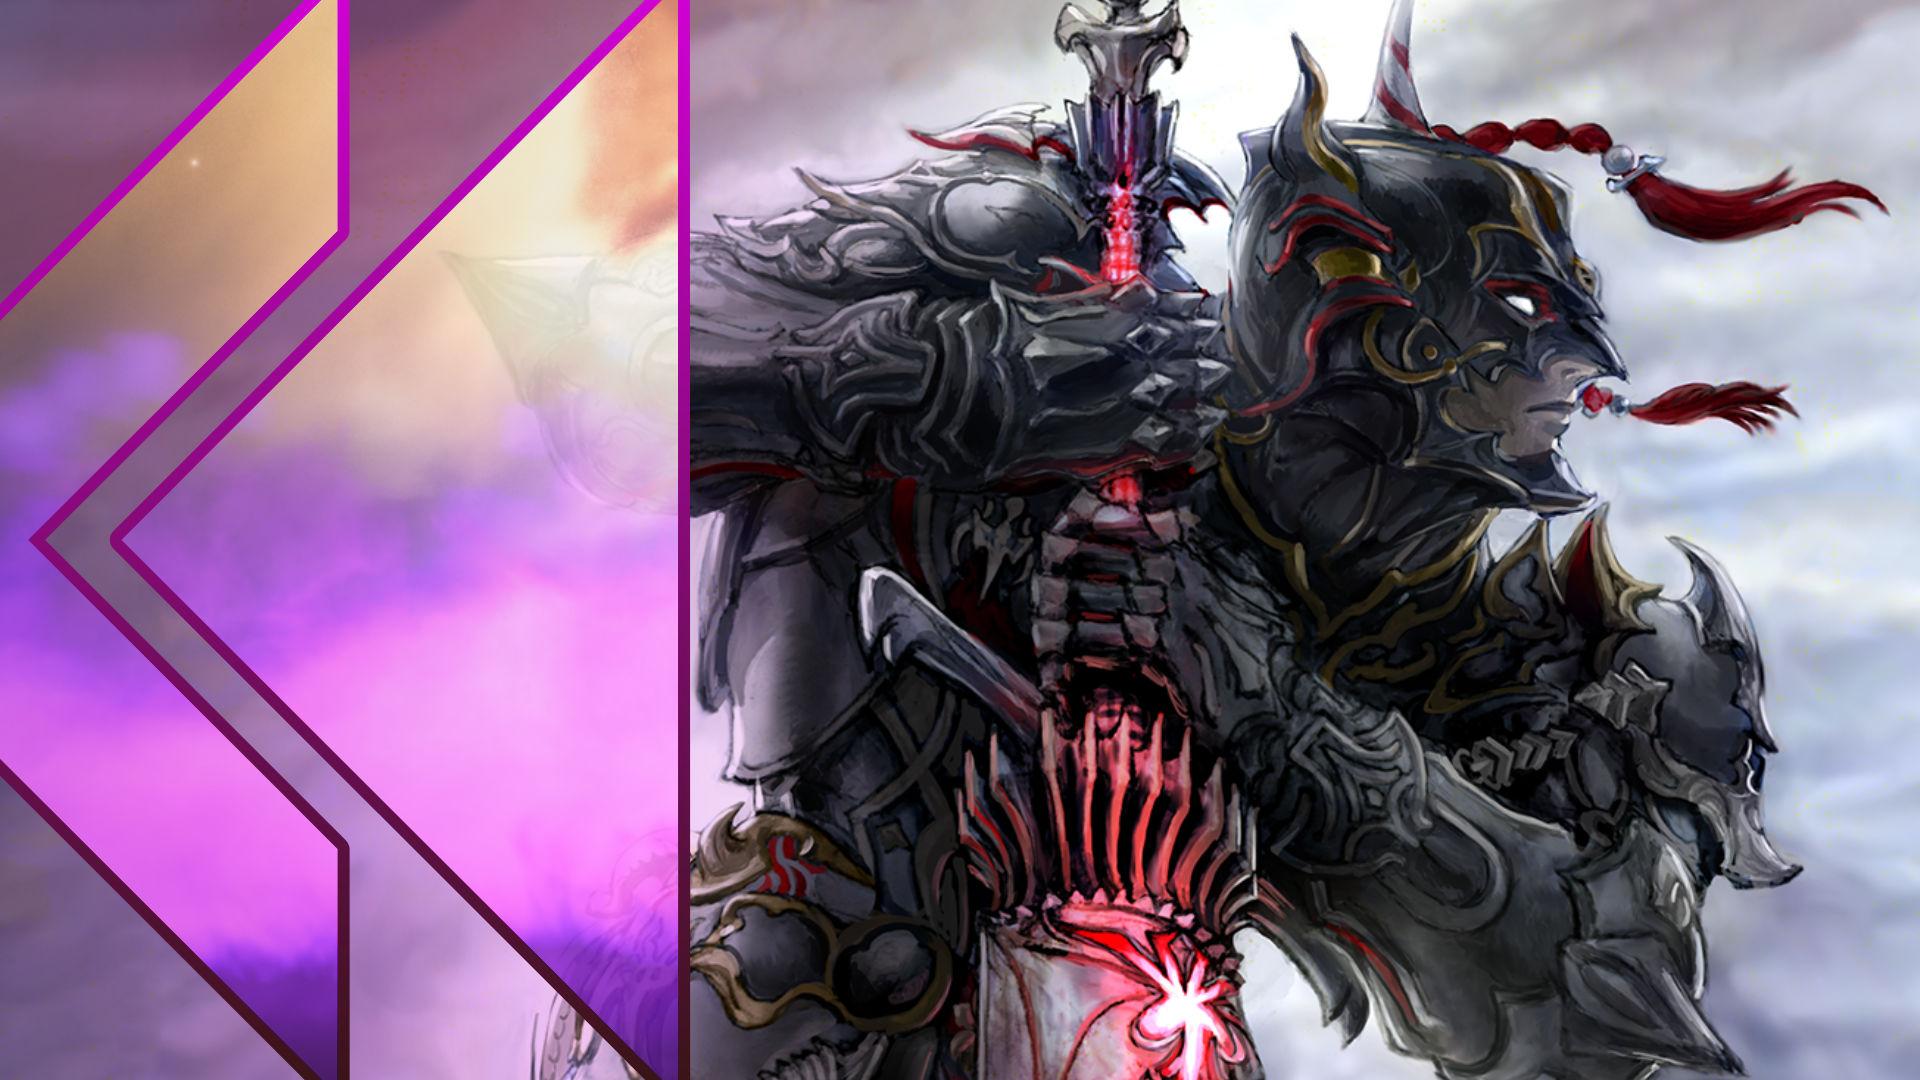 Retro Encounter 291 Final Fantasy XIV: Shadowbringers